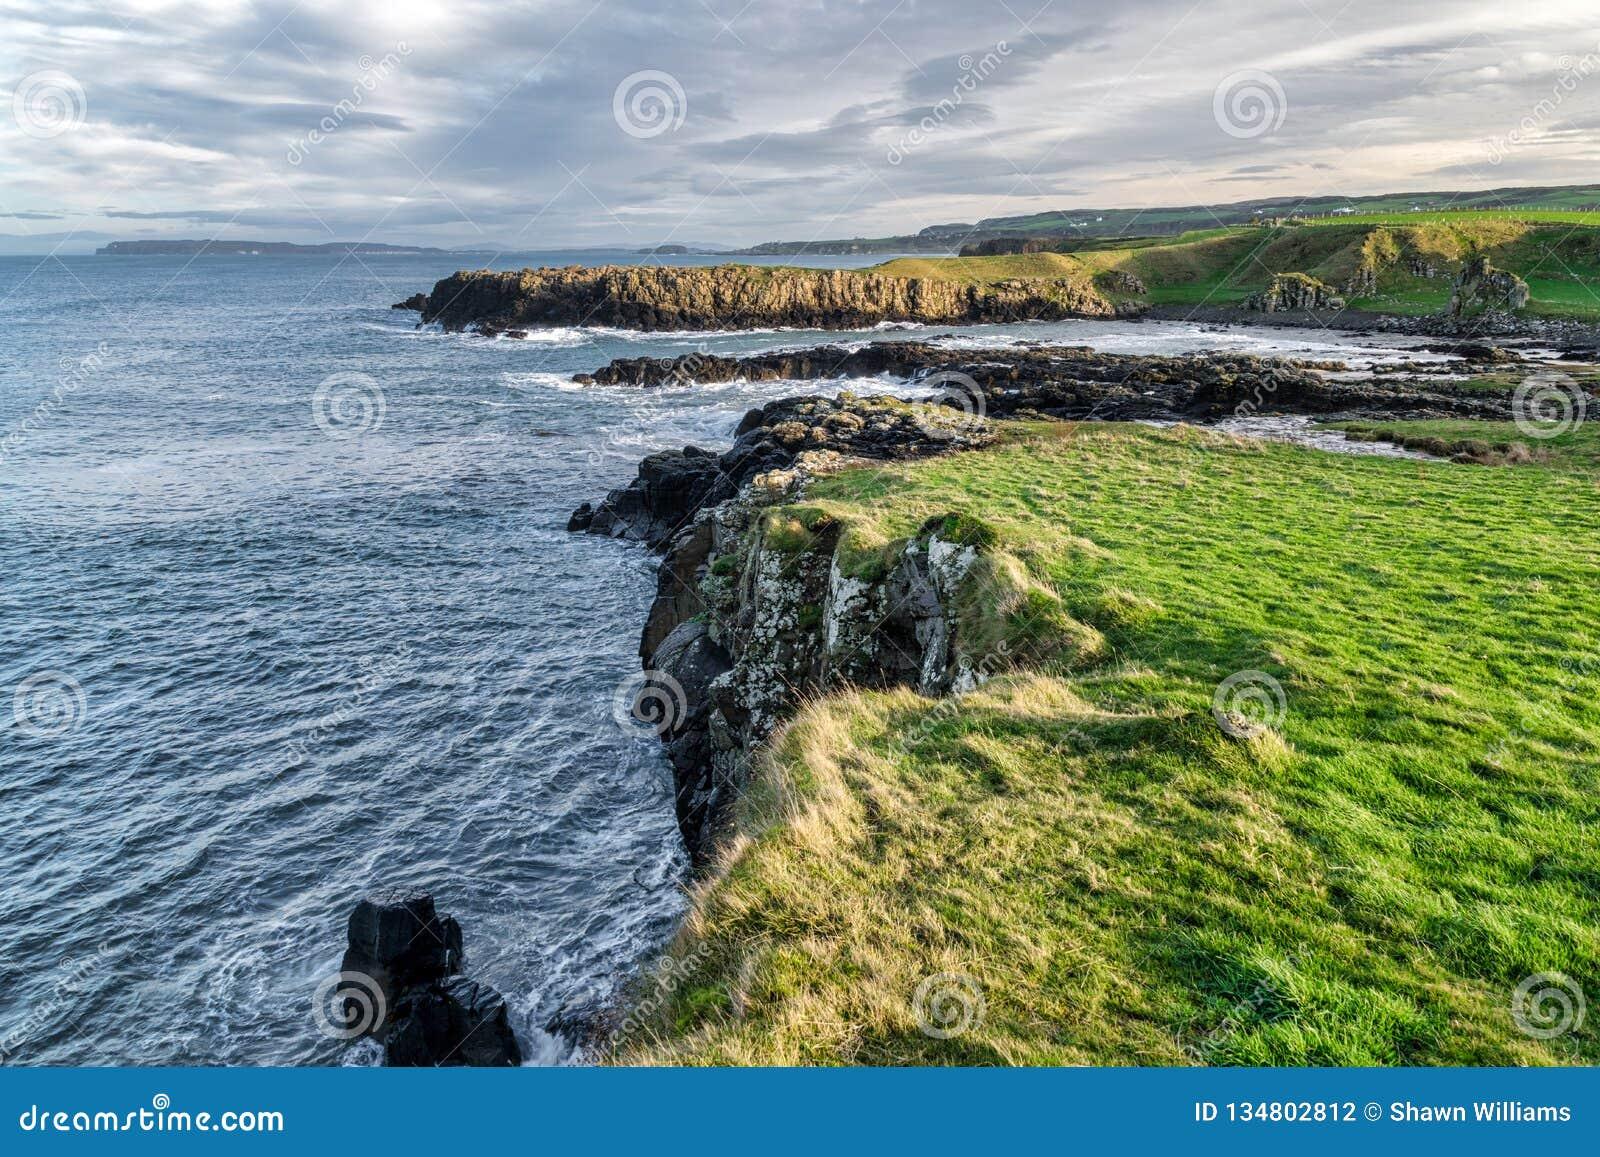 Cliff on the Antrim Coast